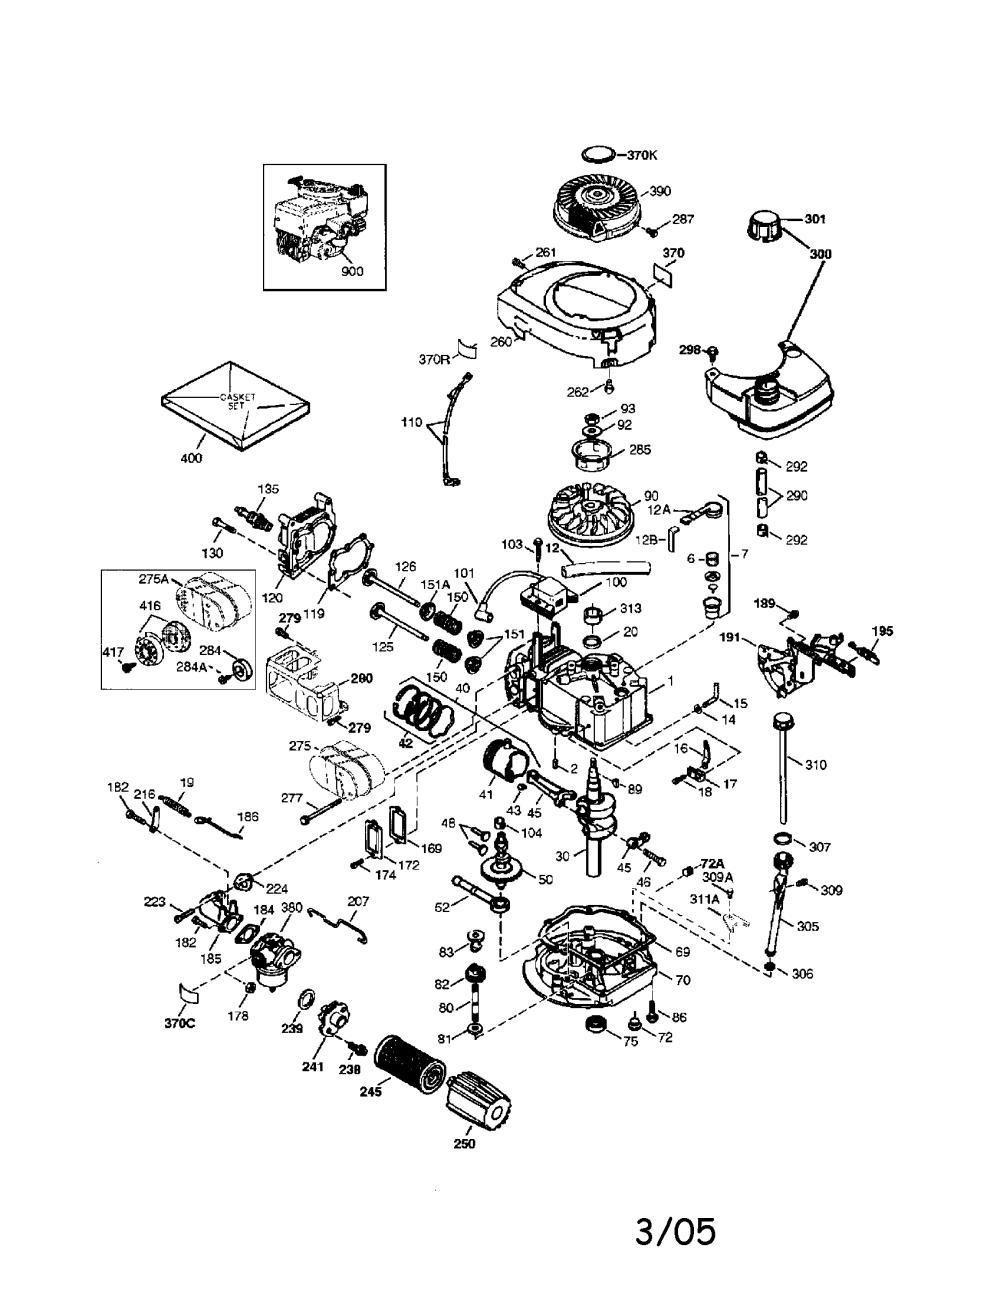 medium resolution of craftsman tecumseh engine parts model 143044500 sears partsdirect rh searspartsdirect com tecumseh 6hp engine diagram tecumseh